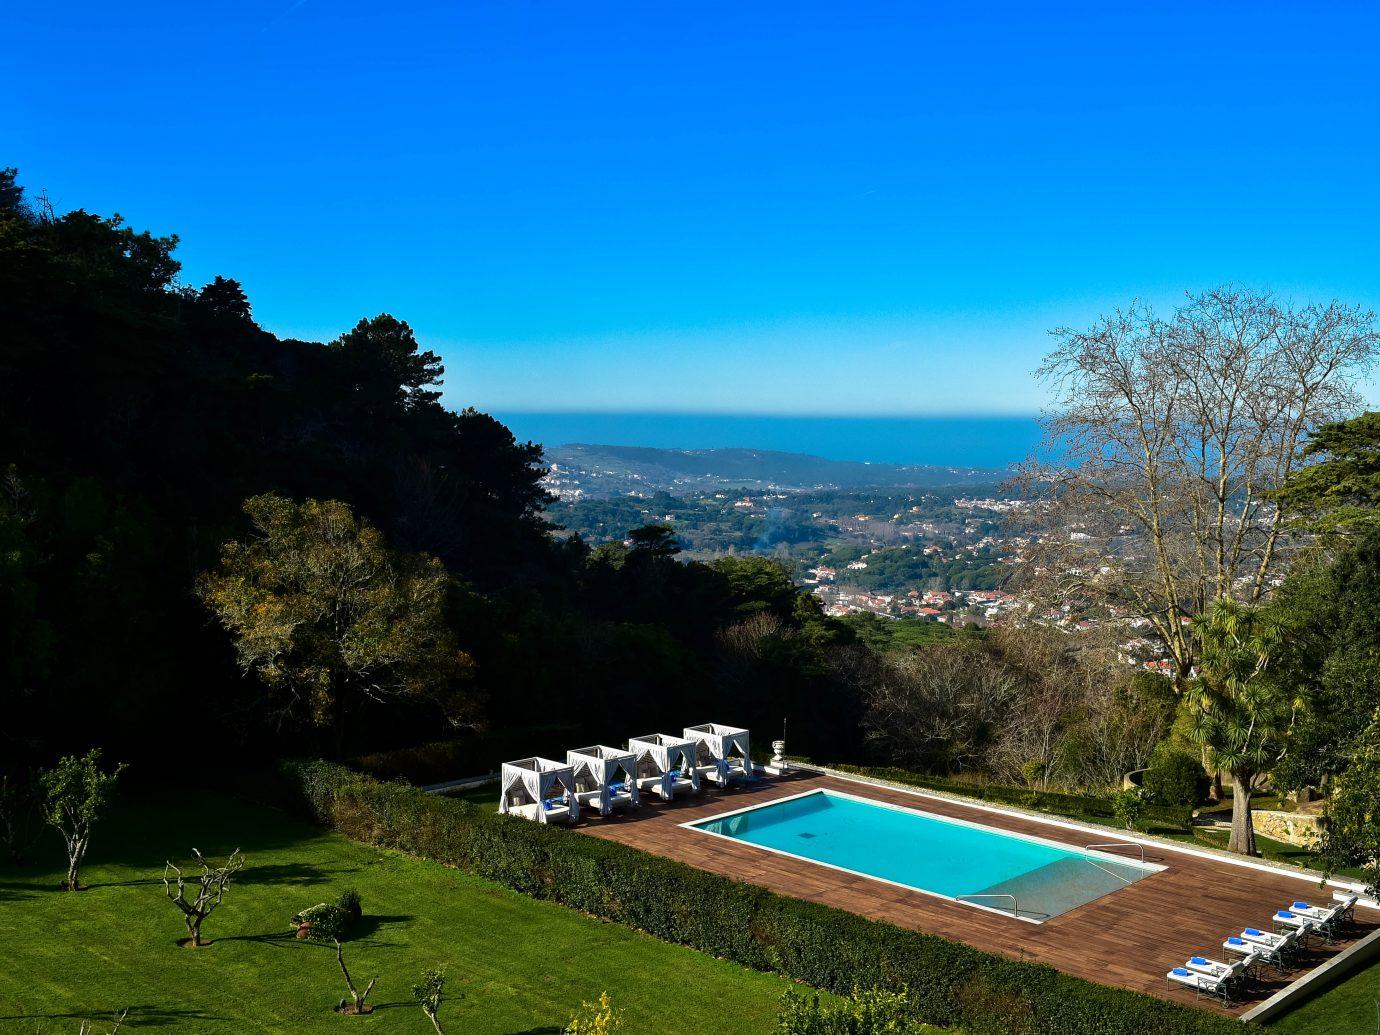 Pool view at Tivoli Palacio de Seteais